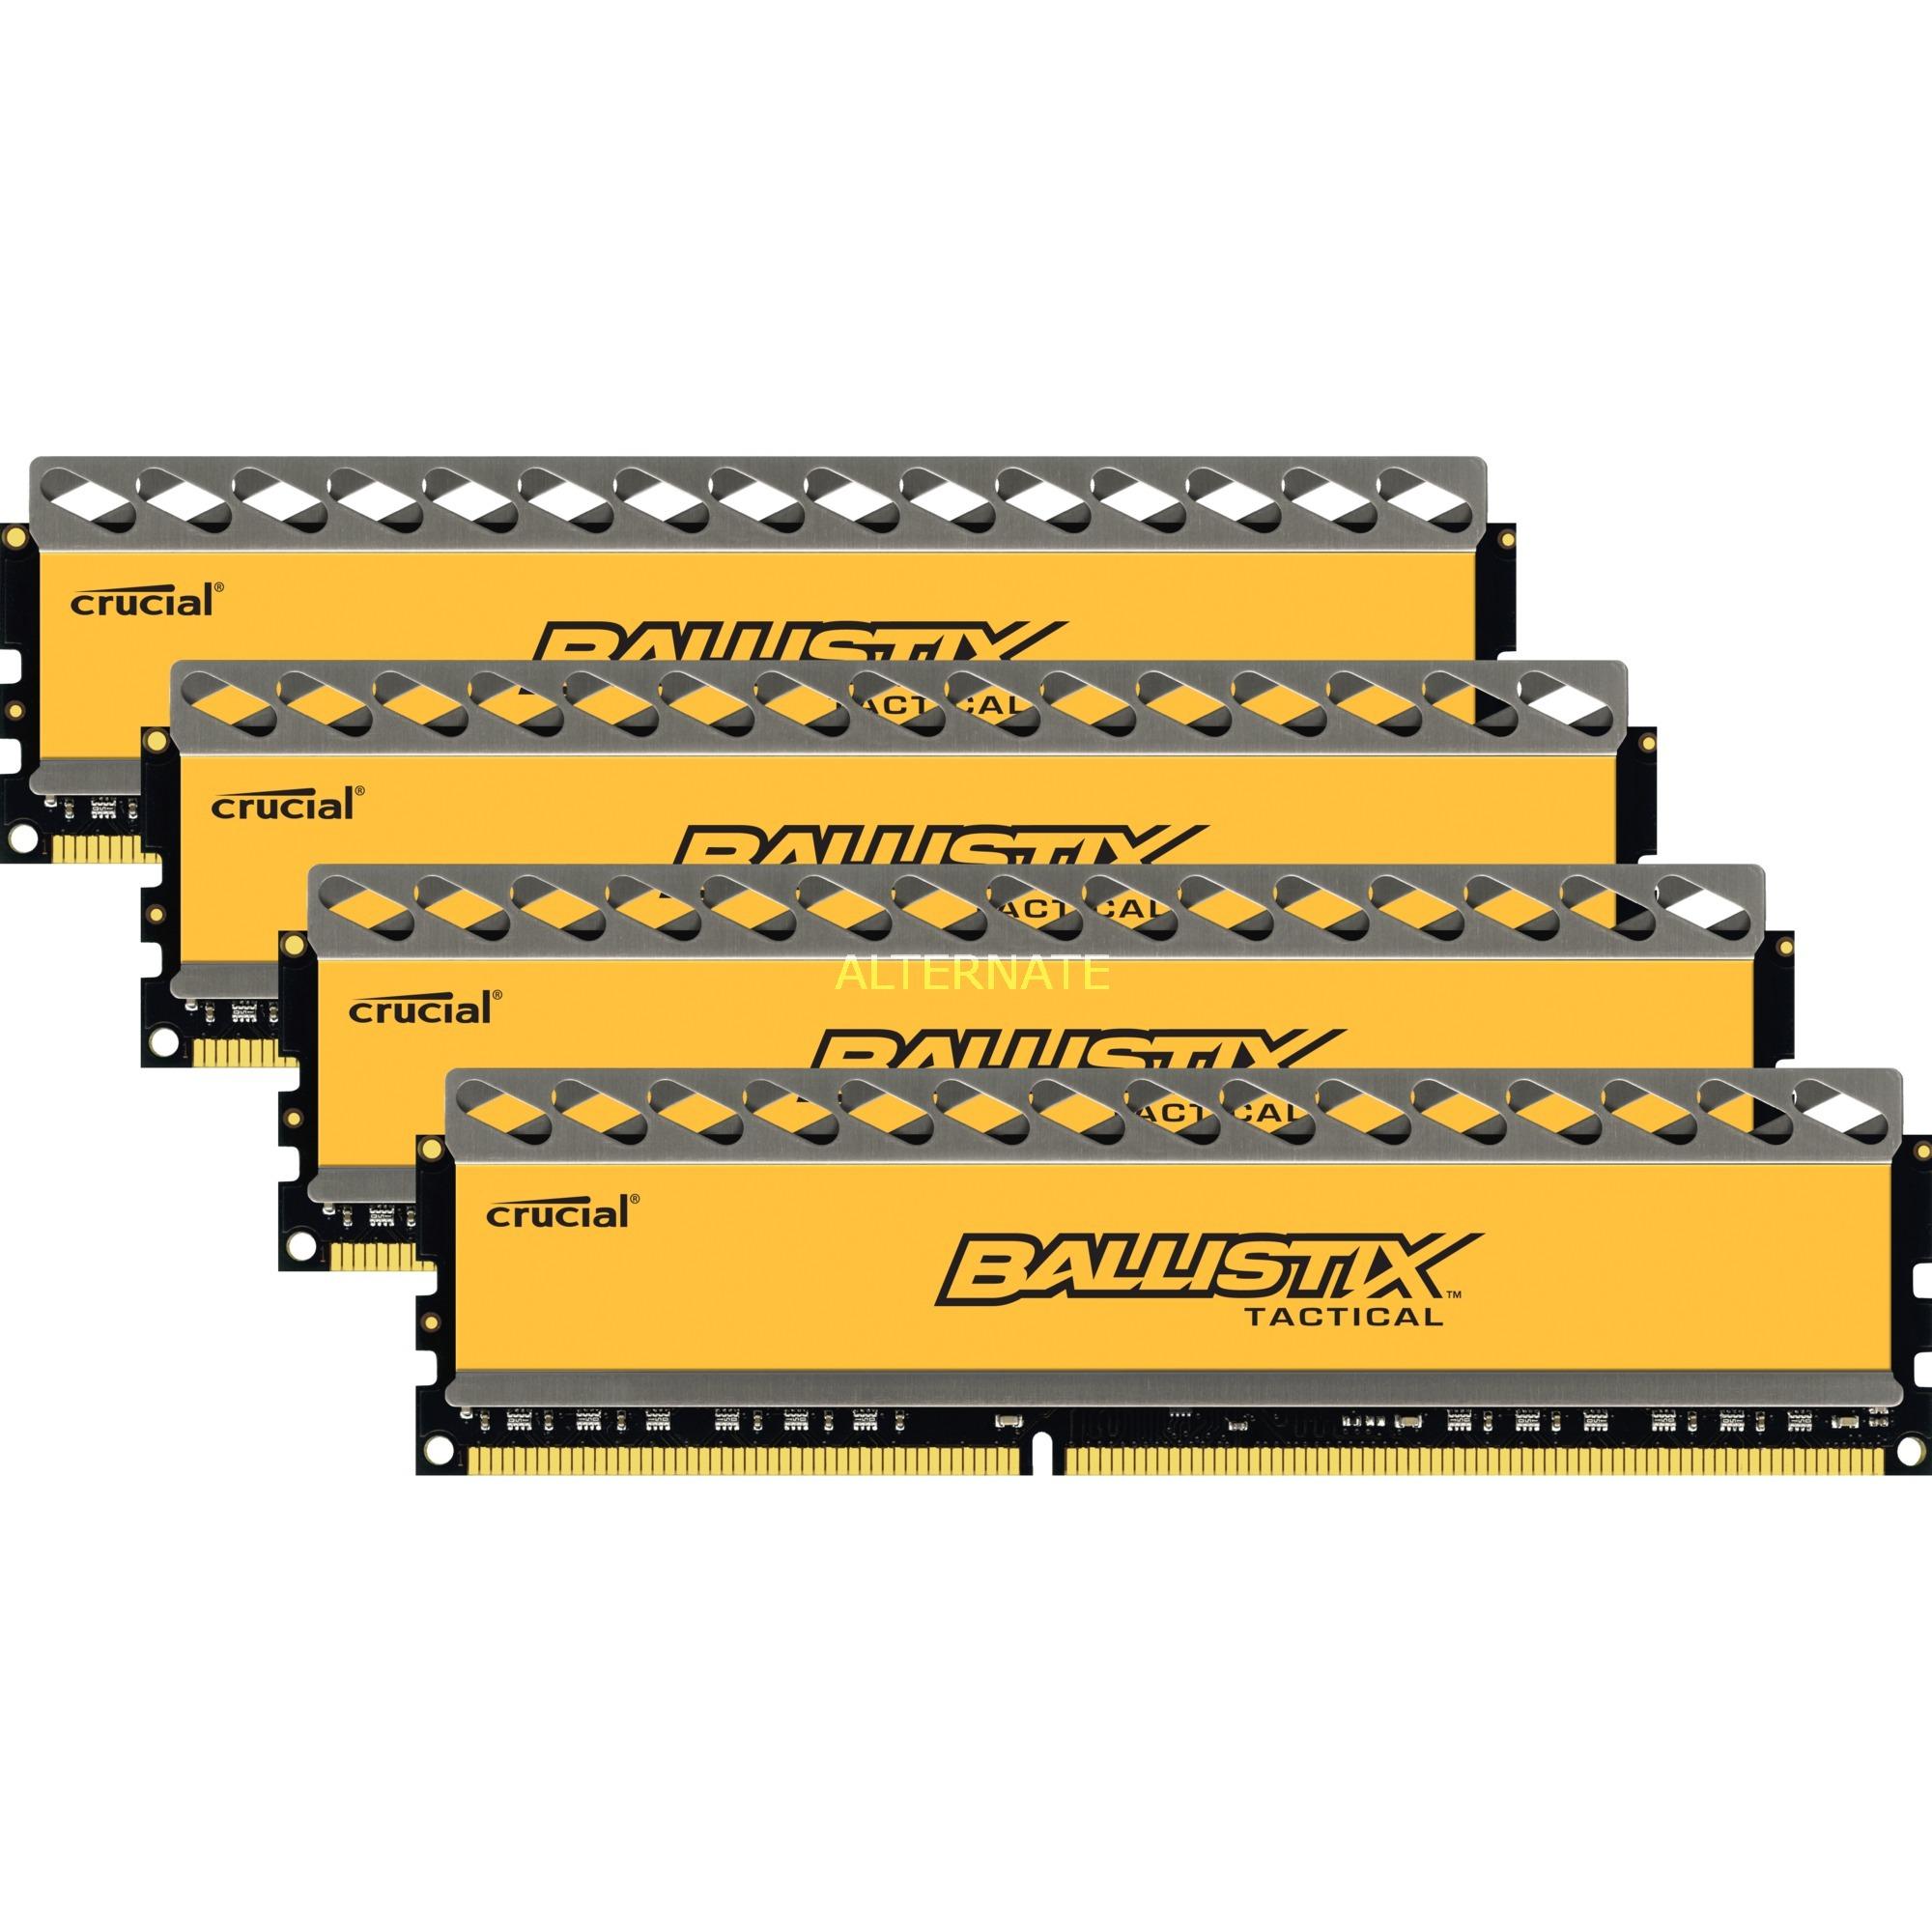 16GB PC3-12800 Kit módulo de memoria DDR3 1600 MHz, Memoria RAM